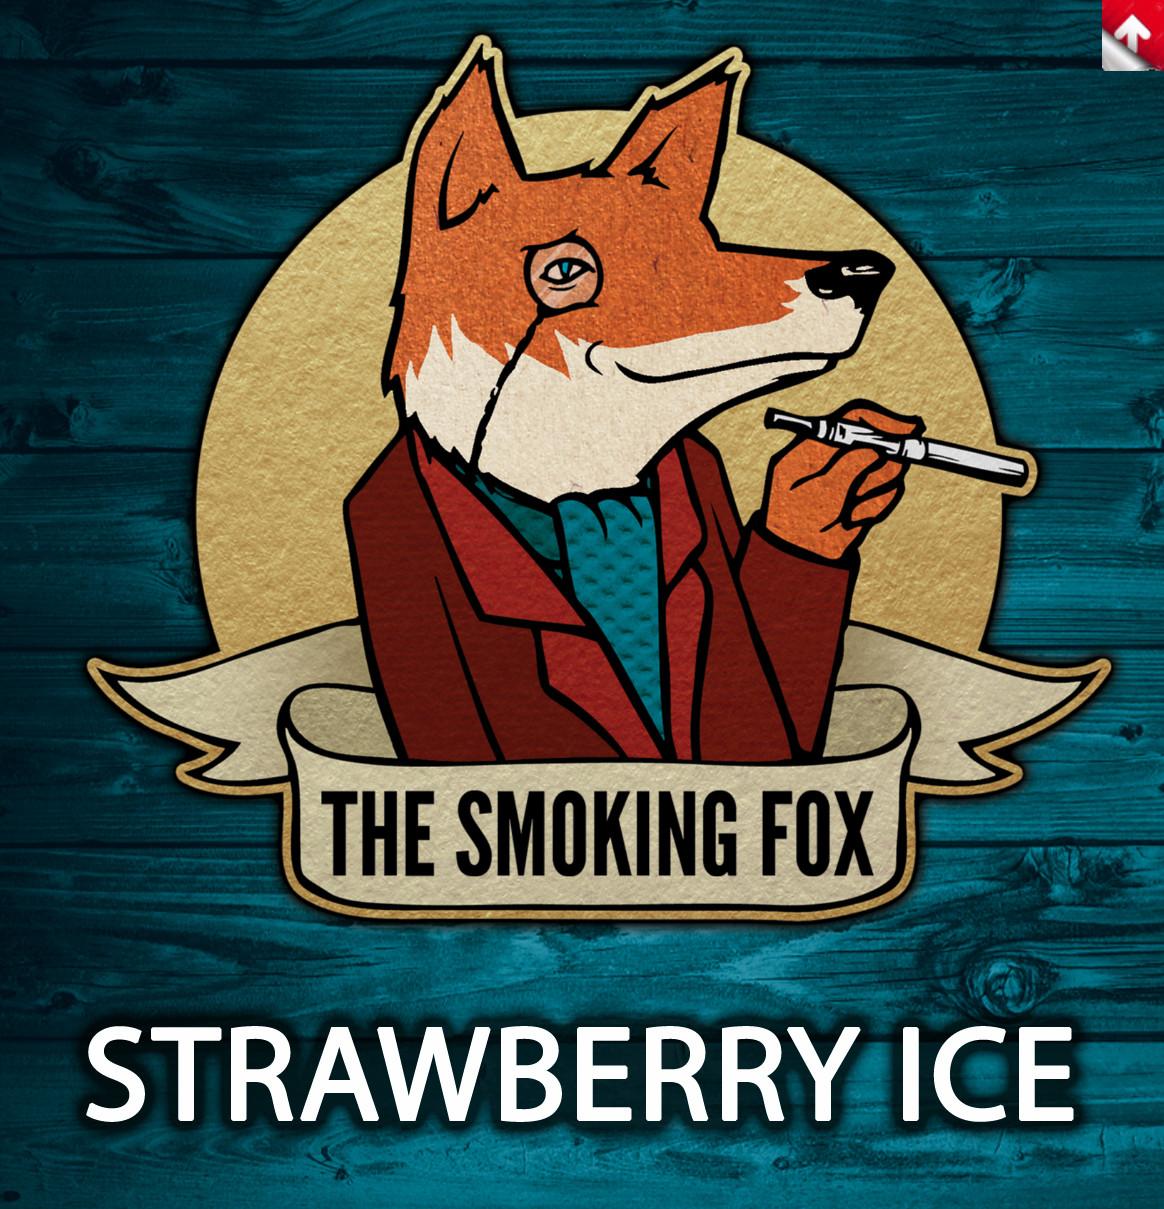 SMOKING FOX 10ml - STRAWBERRY ICE